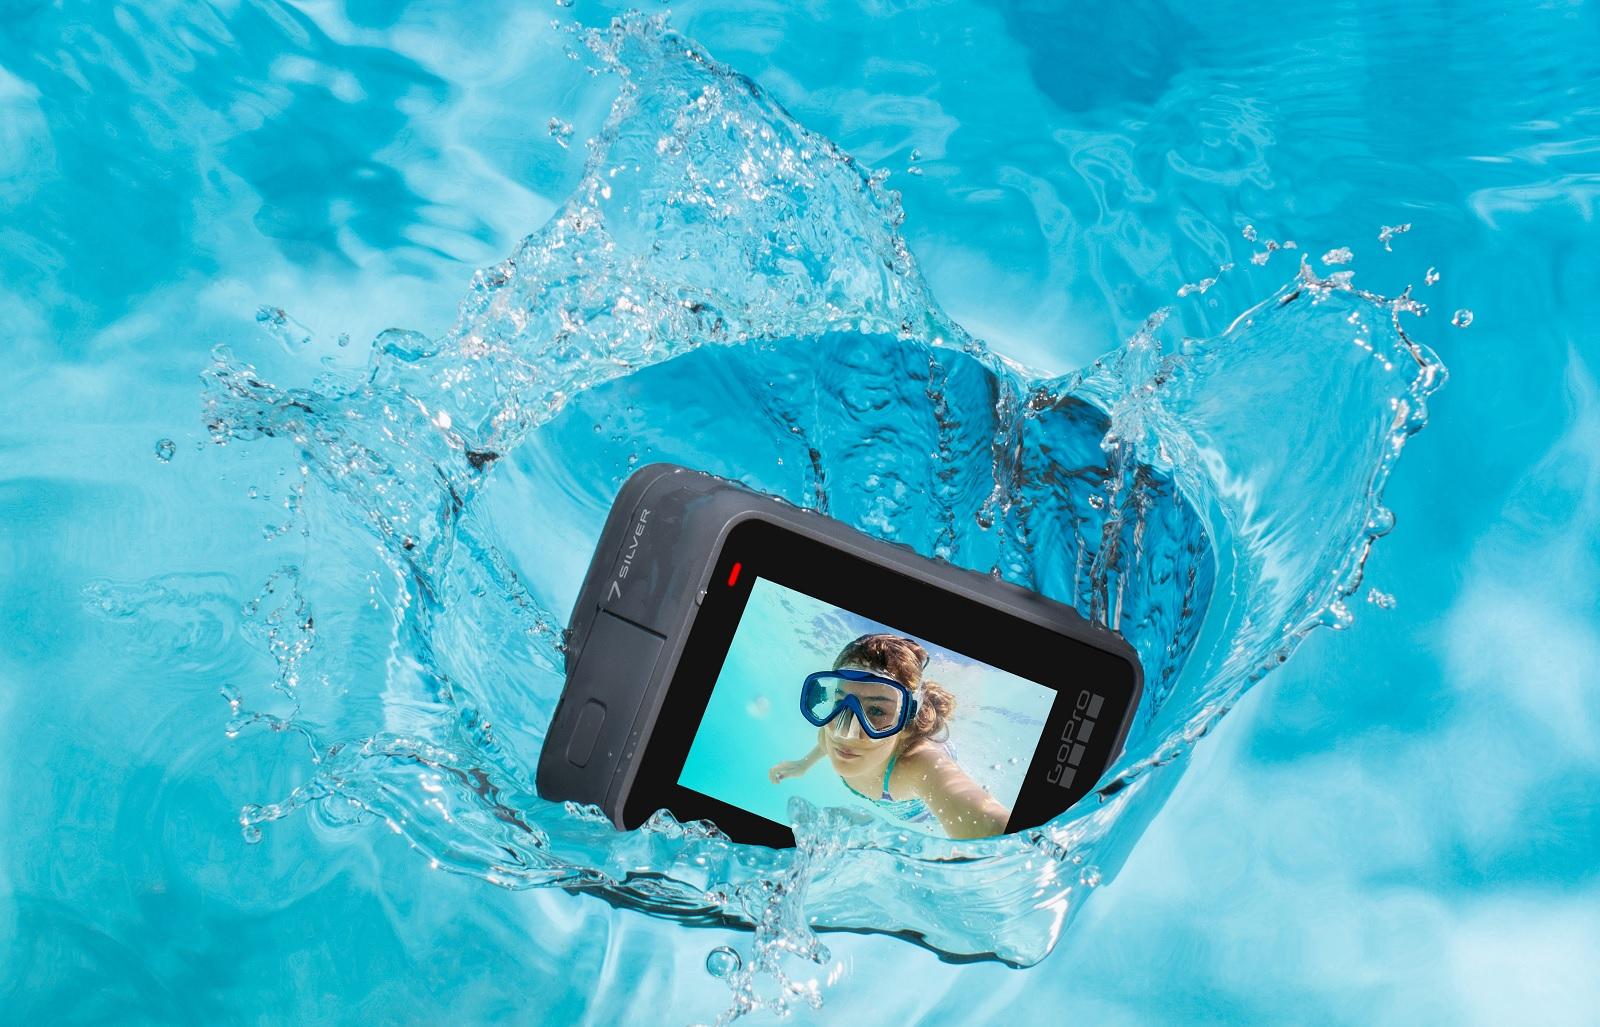 Екшн-камера GOPRO Hero 7 Silver (CHDHC-601-LE), фото 4